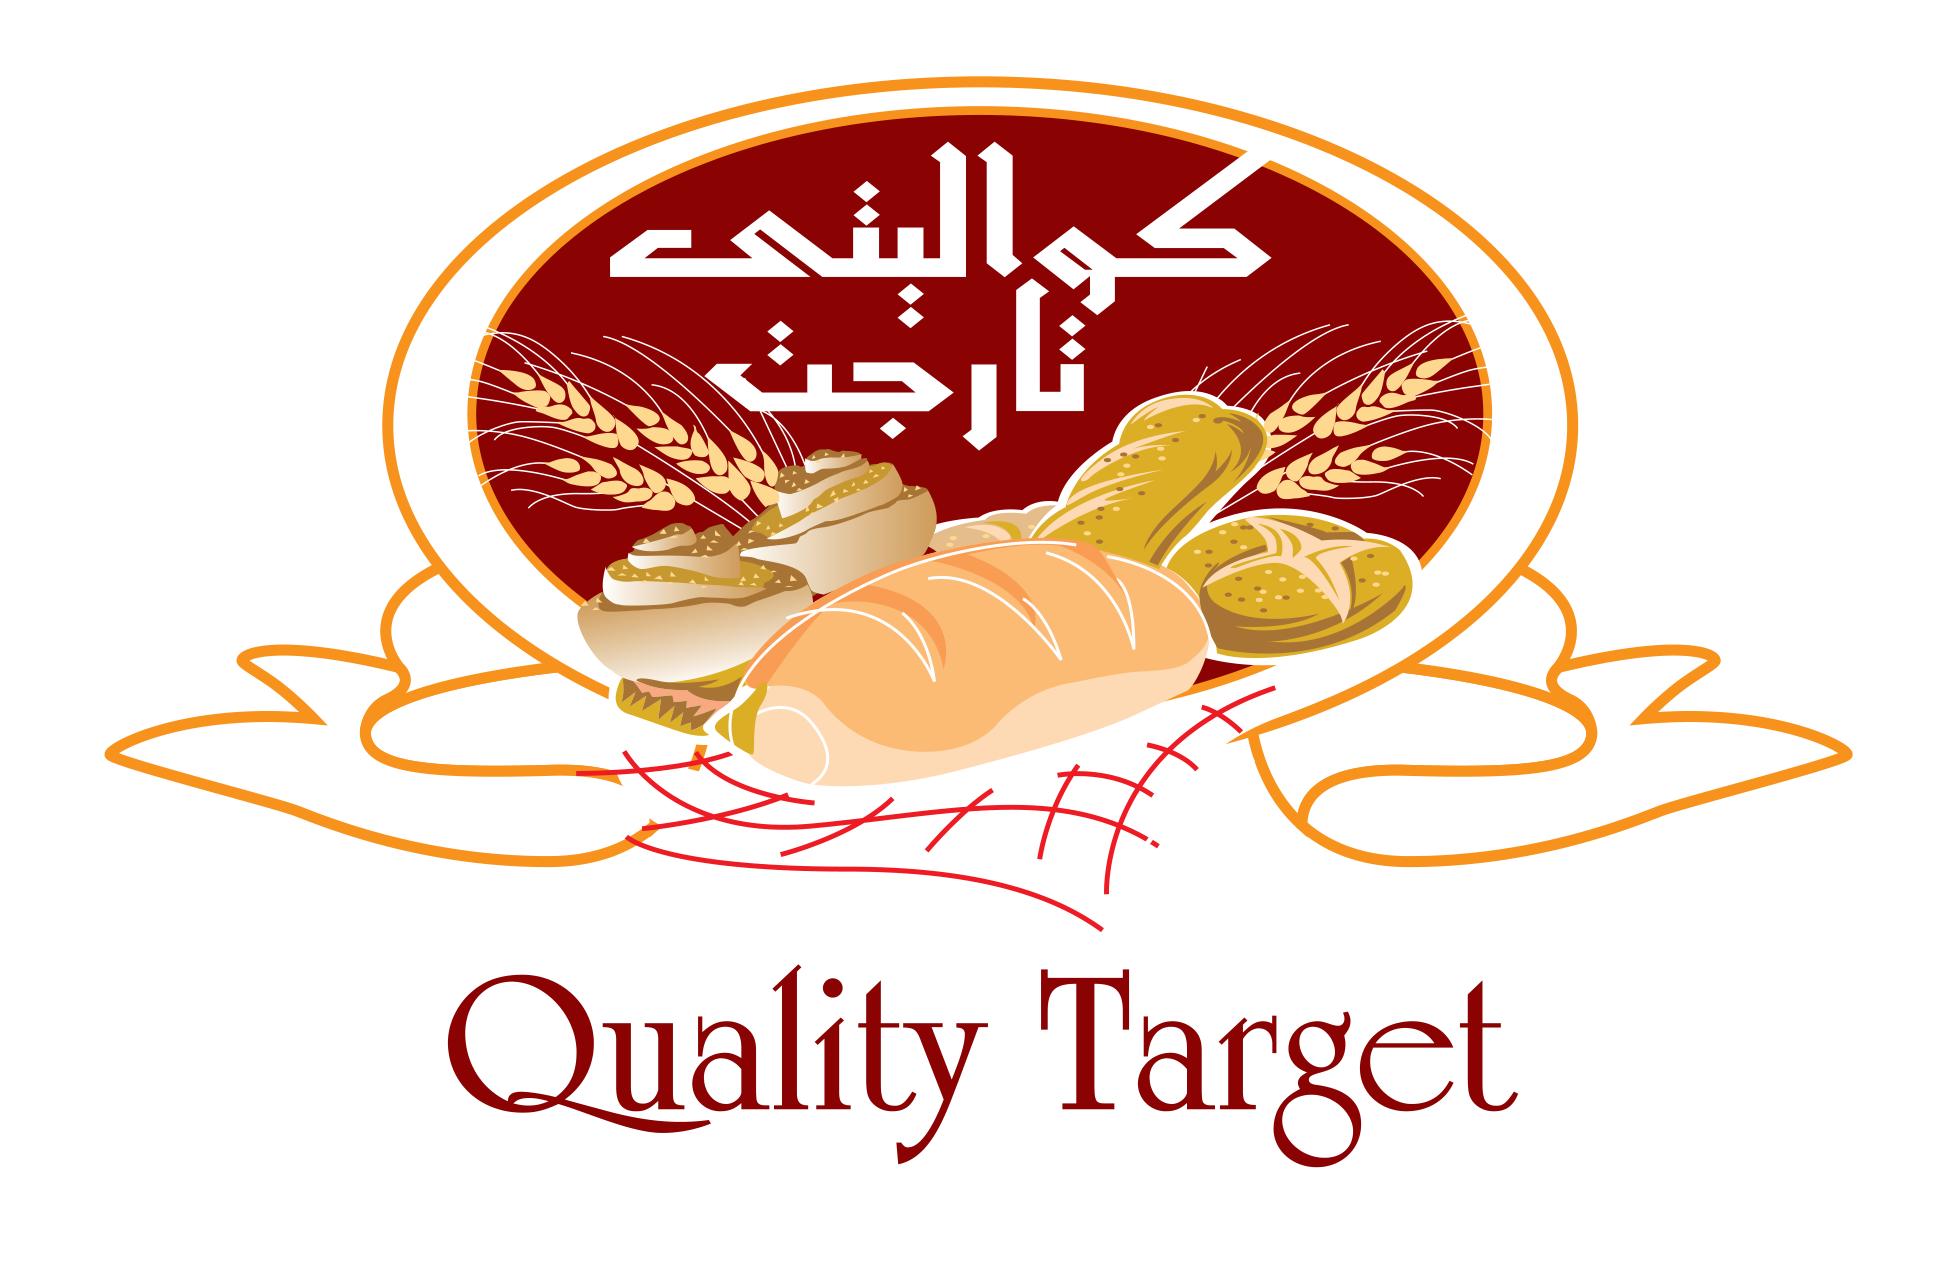 Quality Target